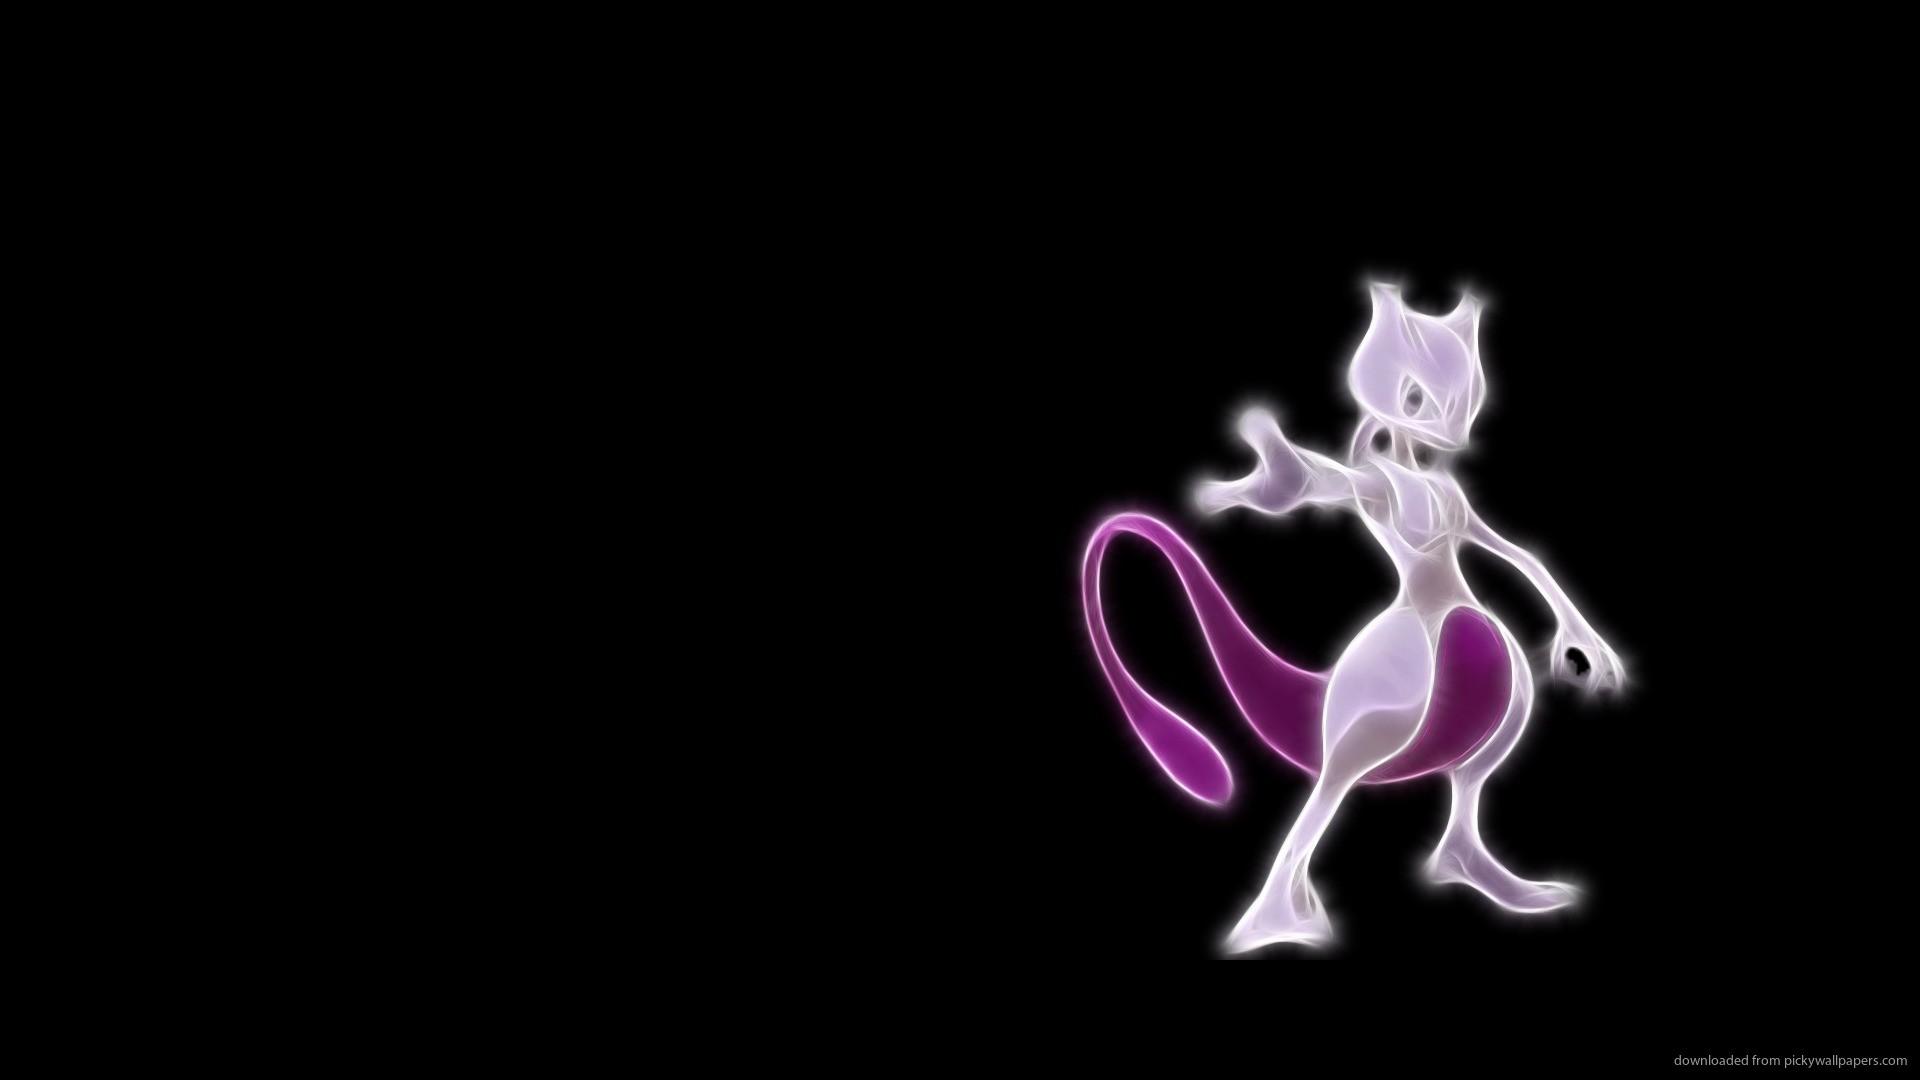 Mewtwo Pokemon Wallpaper picture